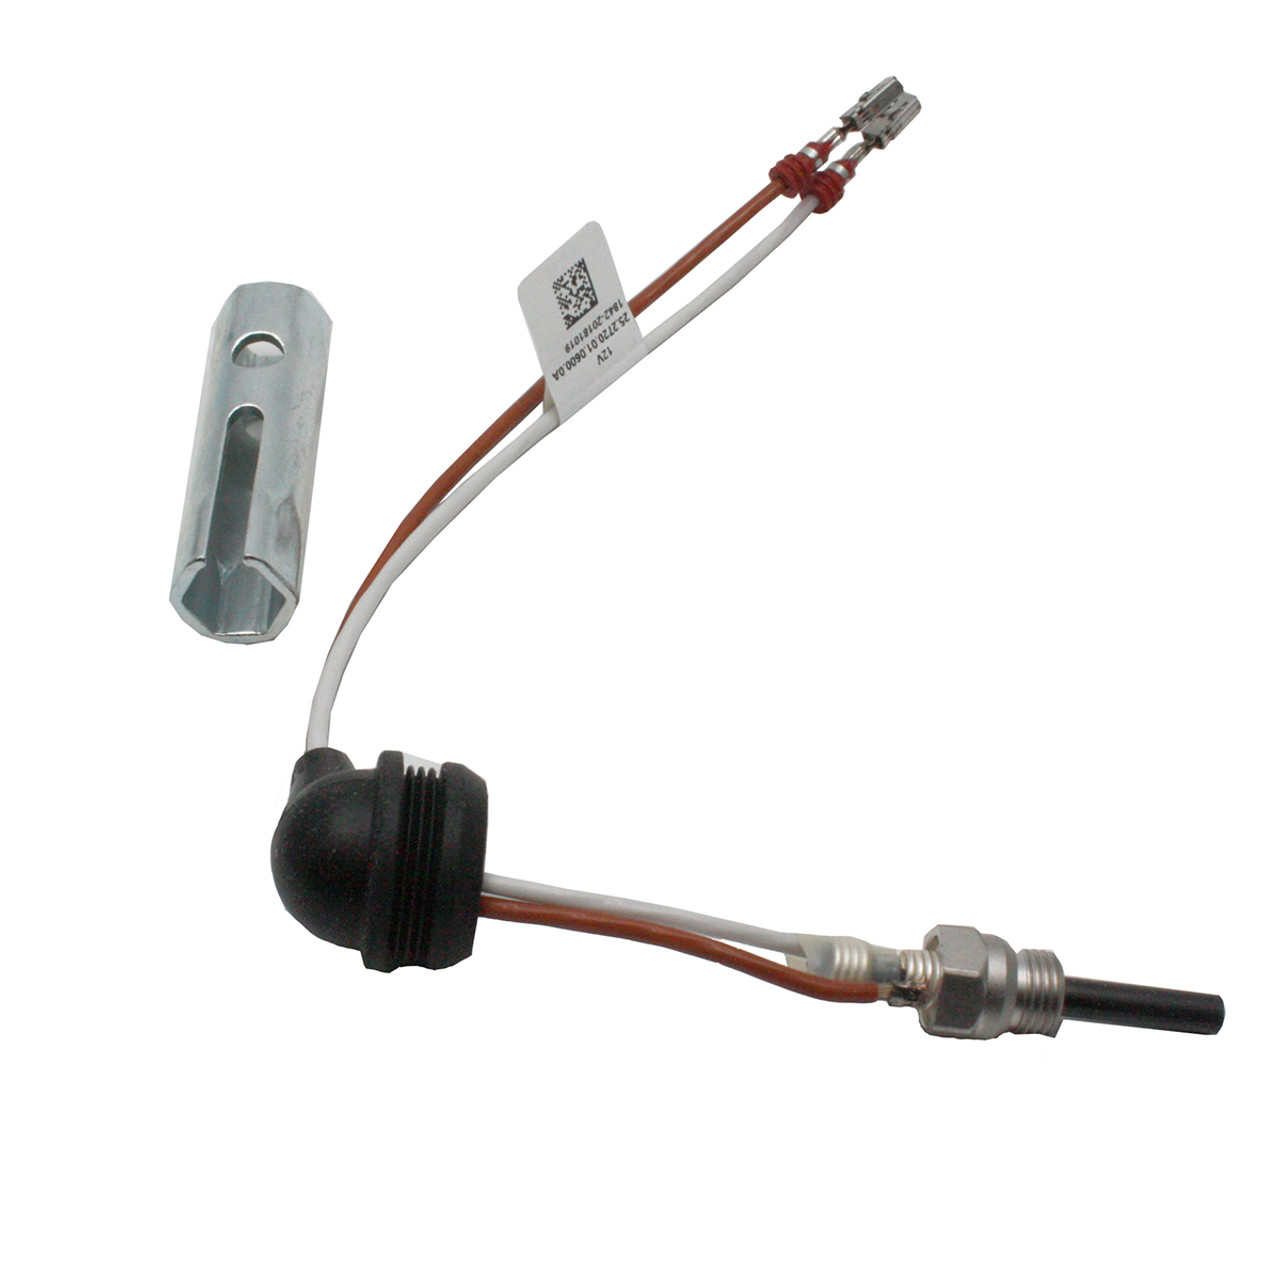 Eberspacher Heater Glow plug 12V 251830010100